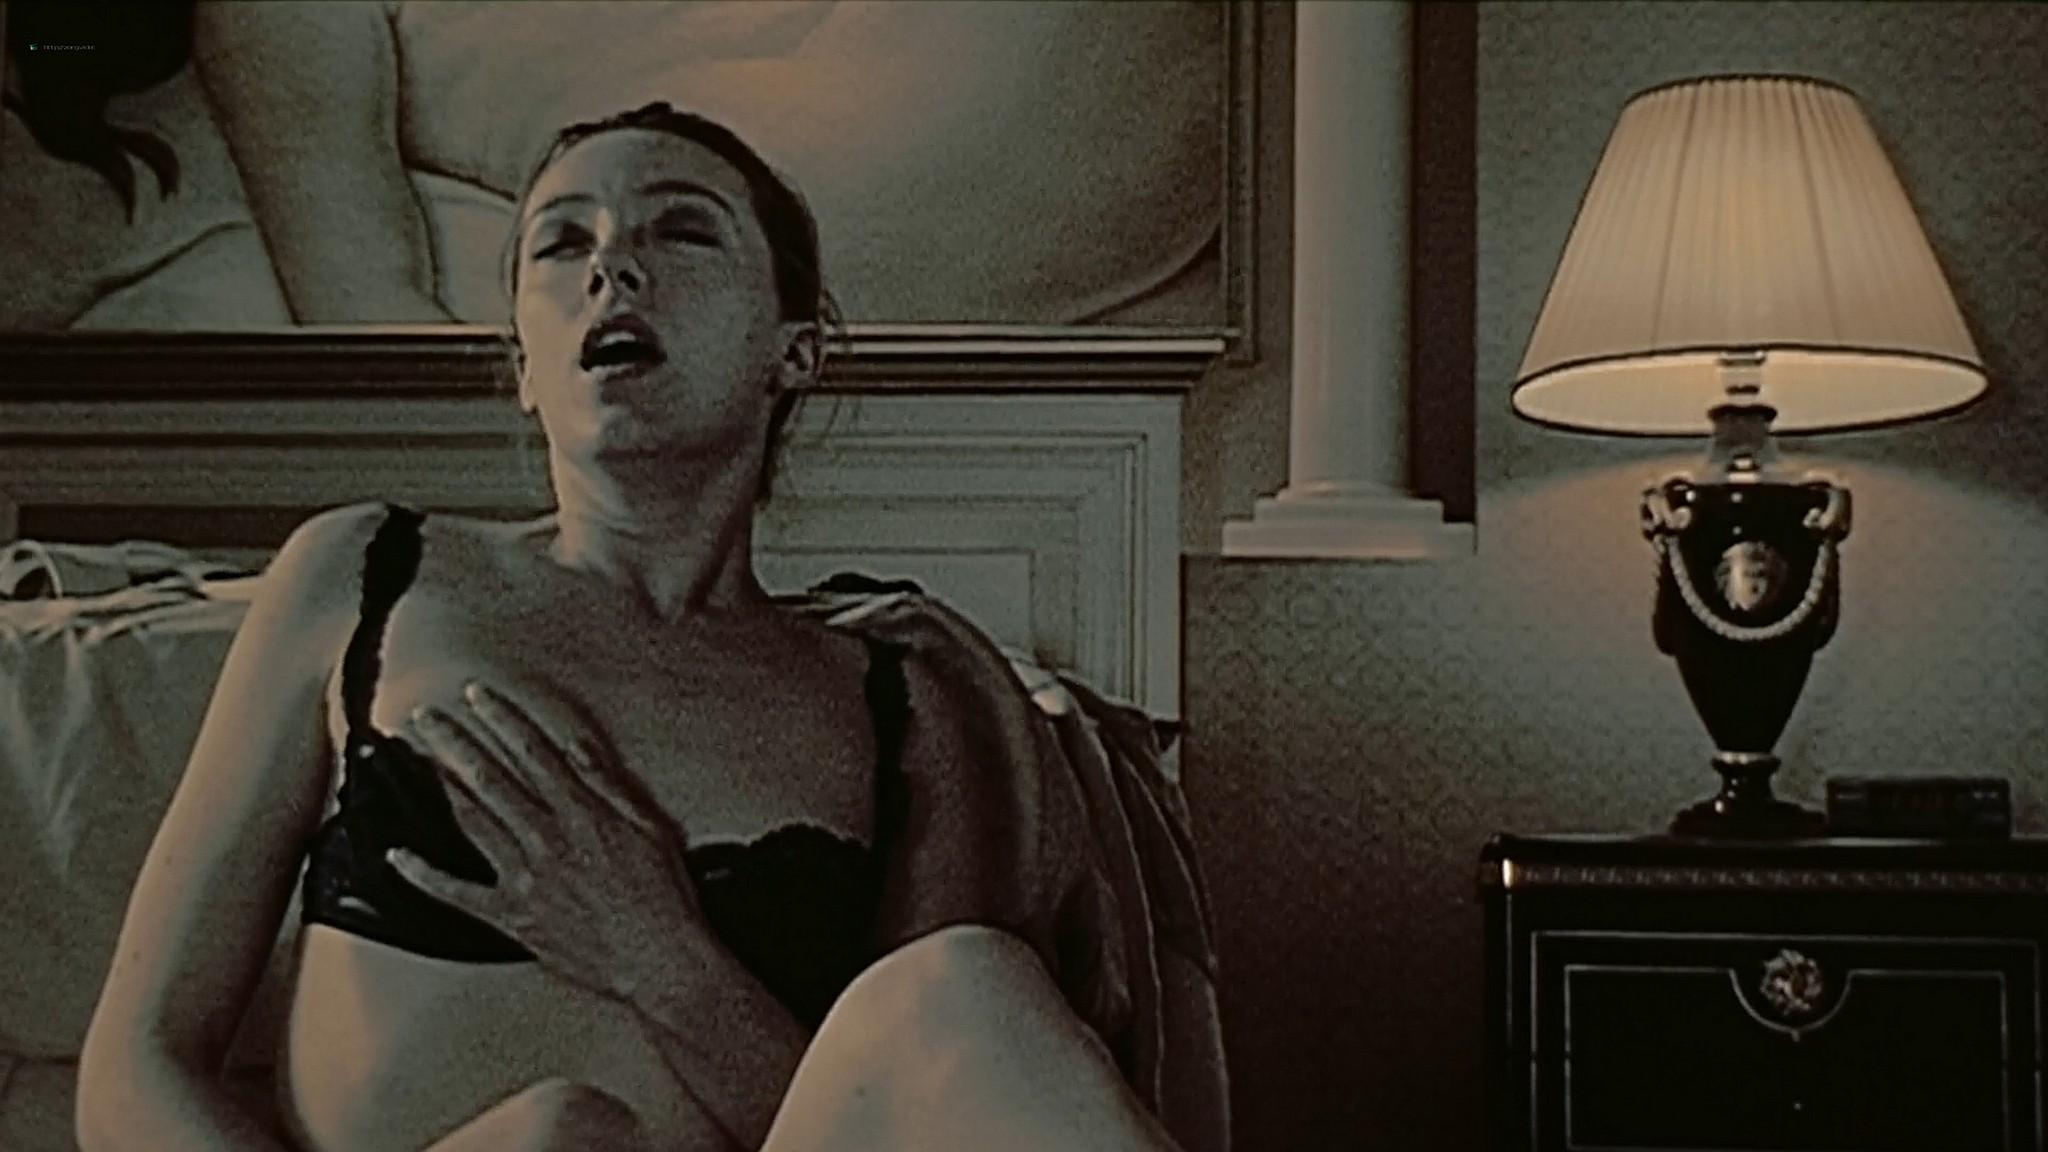 Molly Parker nude sex Alisha Klass explicit Carla Gugino sexy The Center of the World 2001 1080p 19